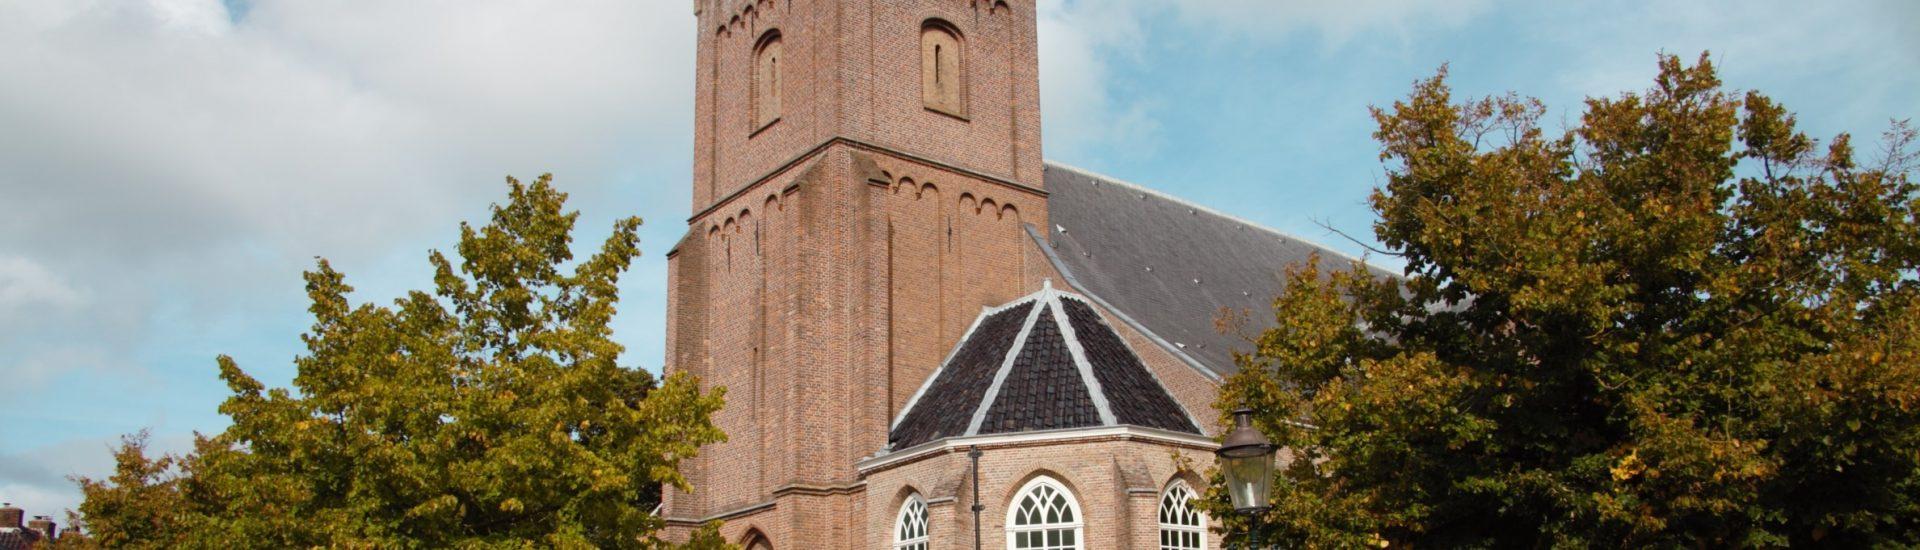 Burgerbelangen Bodegraven - Reeuwijk